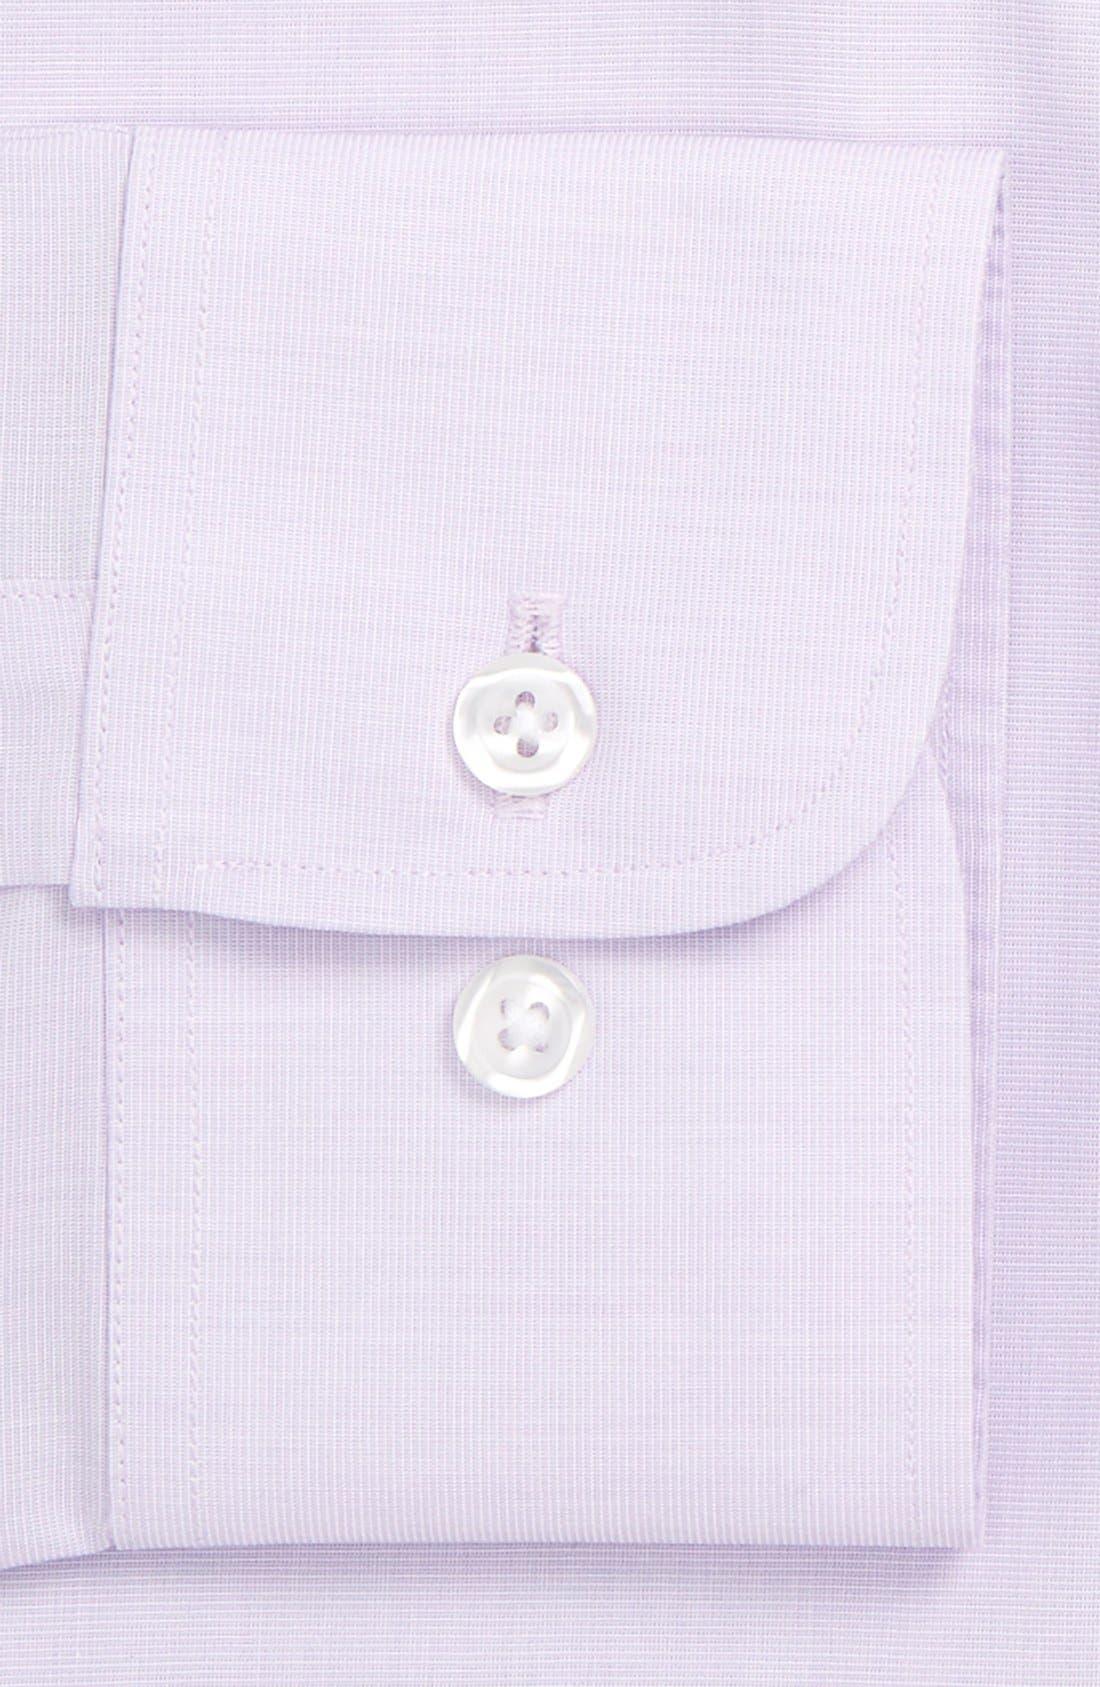 Slim Fit Wrinkle Free Solid Dress Shirt,                             Alternate thumbnail 3, color,                             Pale Lilac